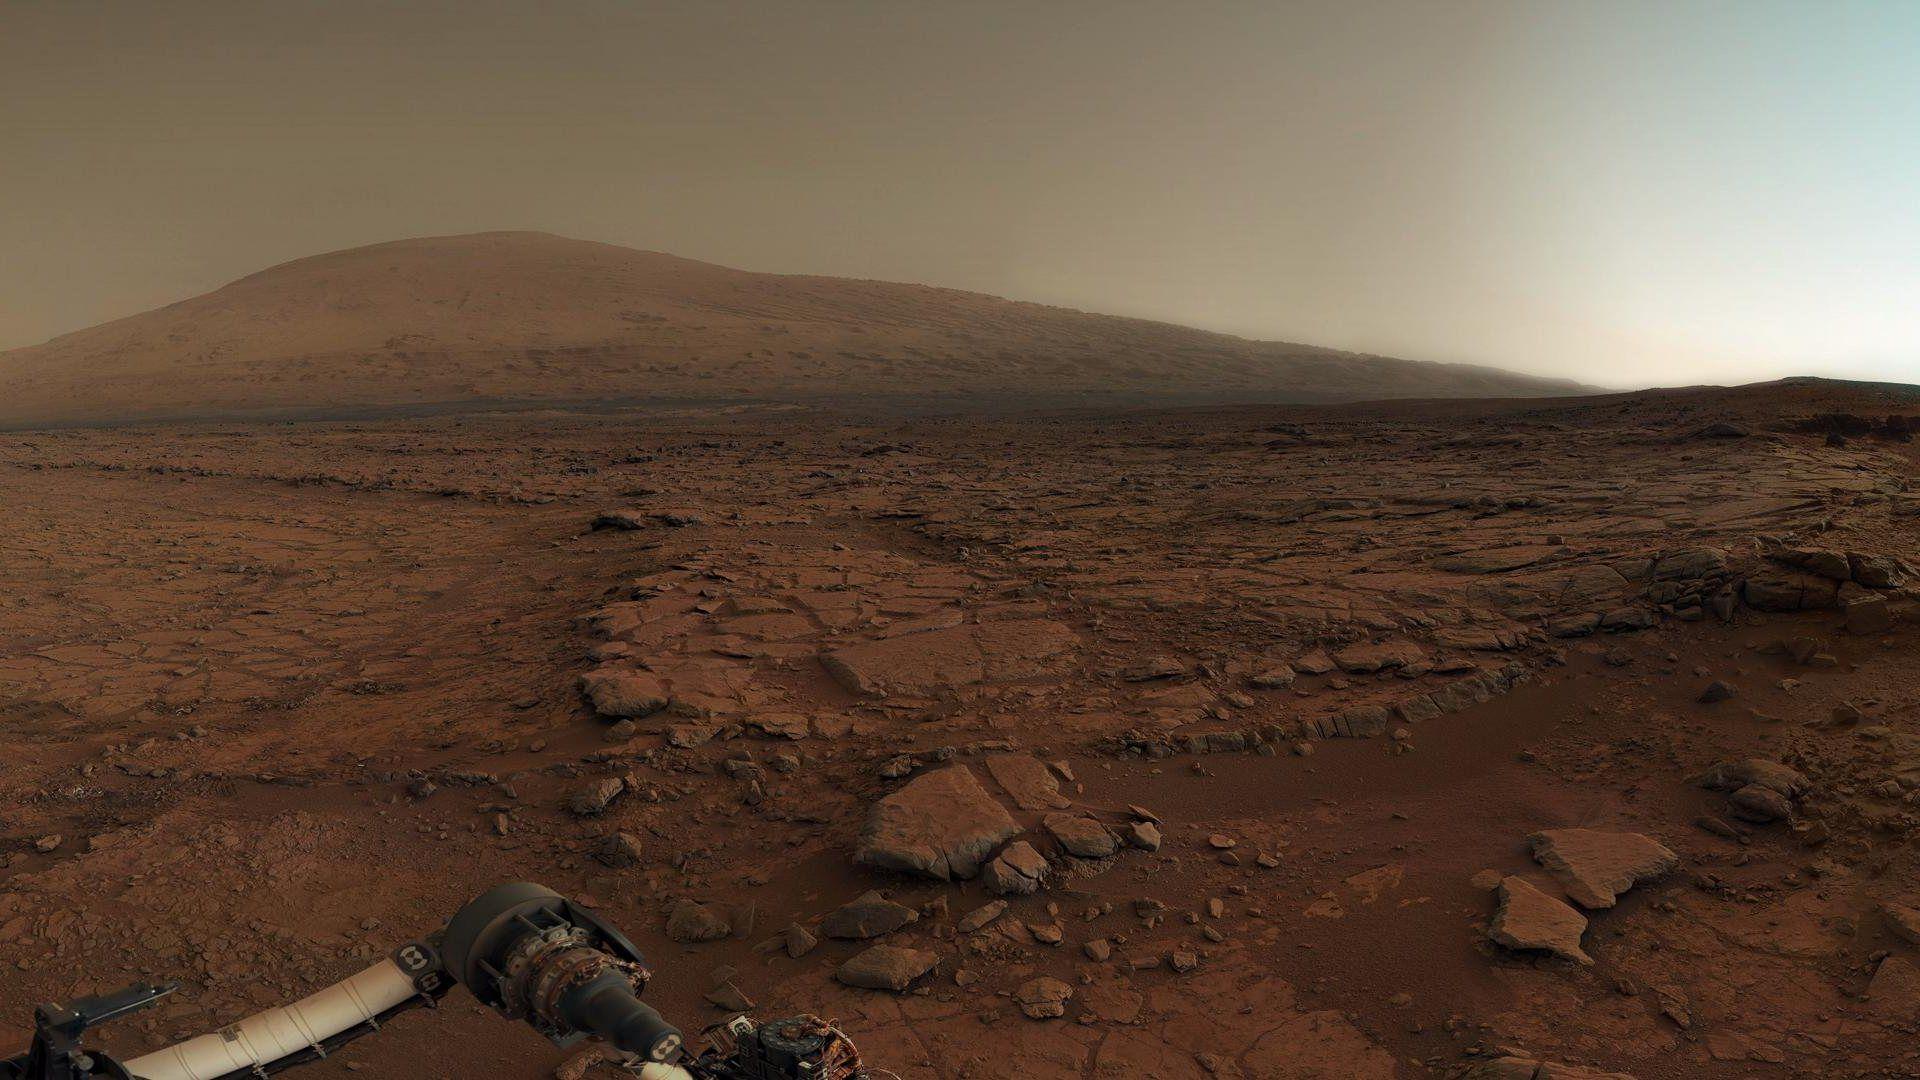 Mars Surface HD Wallpaper | 1920x1080 | ID:50544 | Space ...